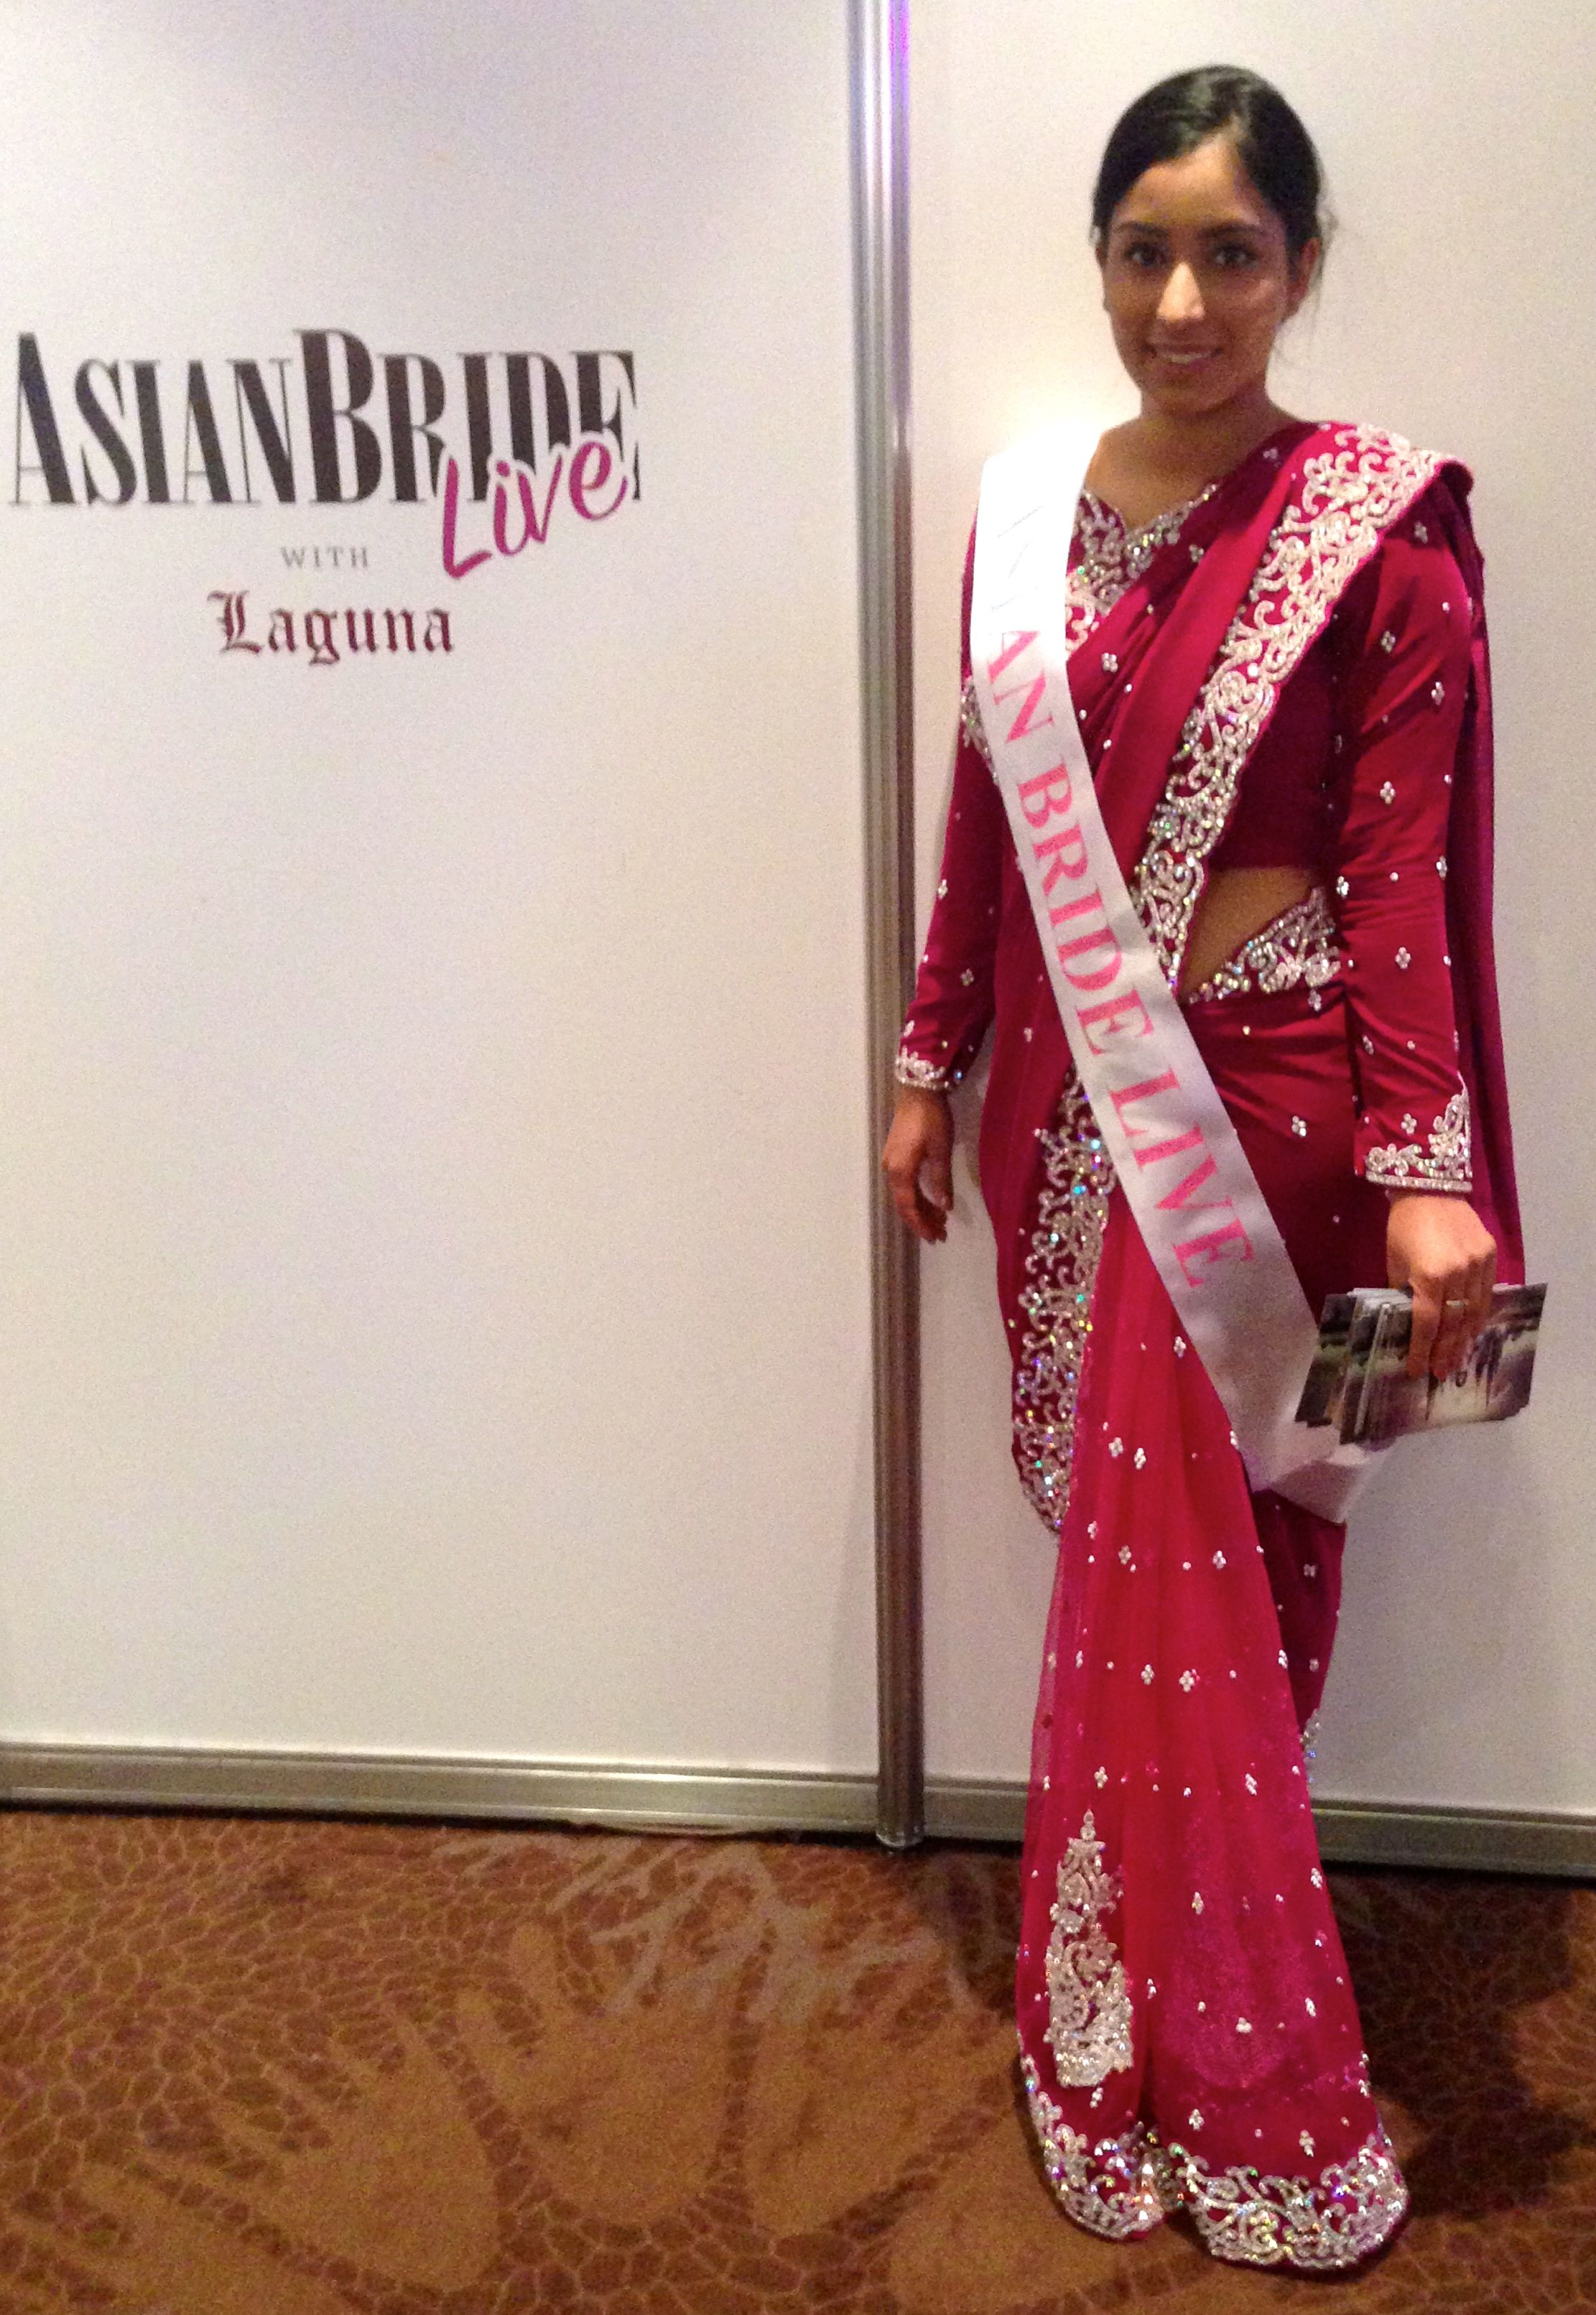 Asian Bride Model at Asian Bride Live Wedding Exhibition London.